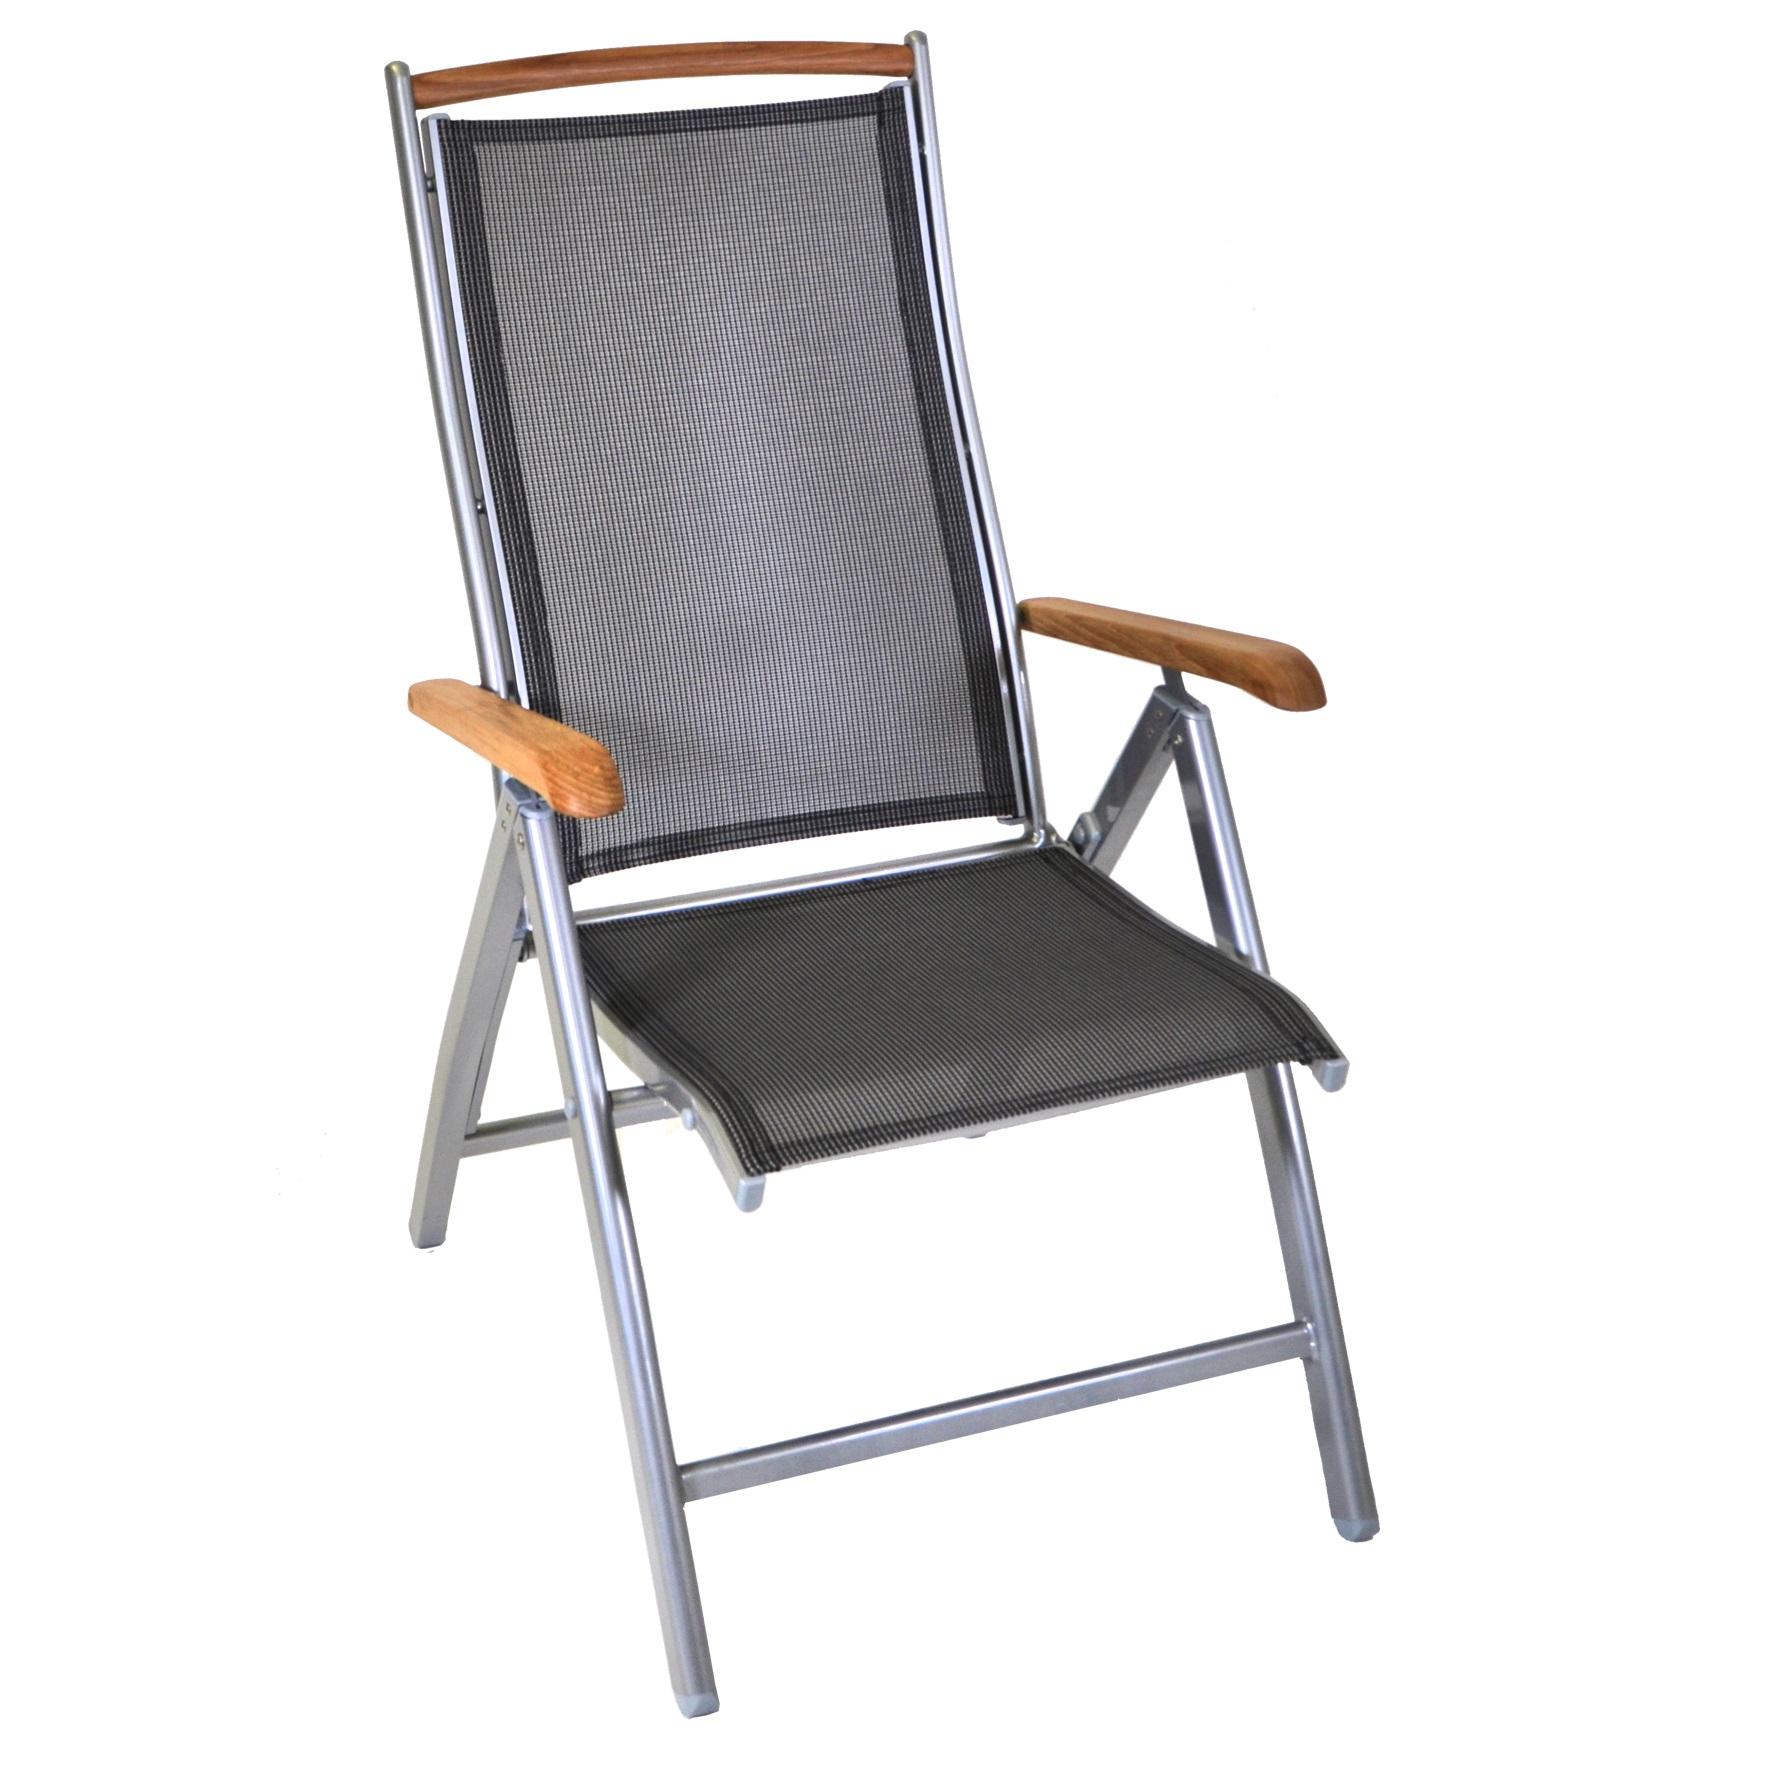 gartenst hle garten gap aktuell. Black Bedroom Furniture Sets. Home Design Ideas